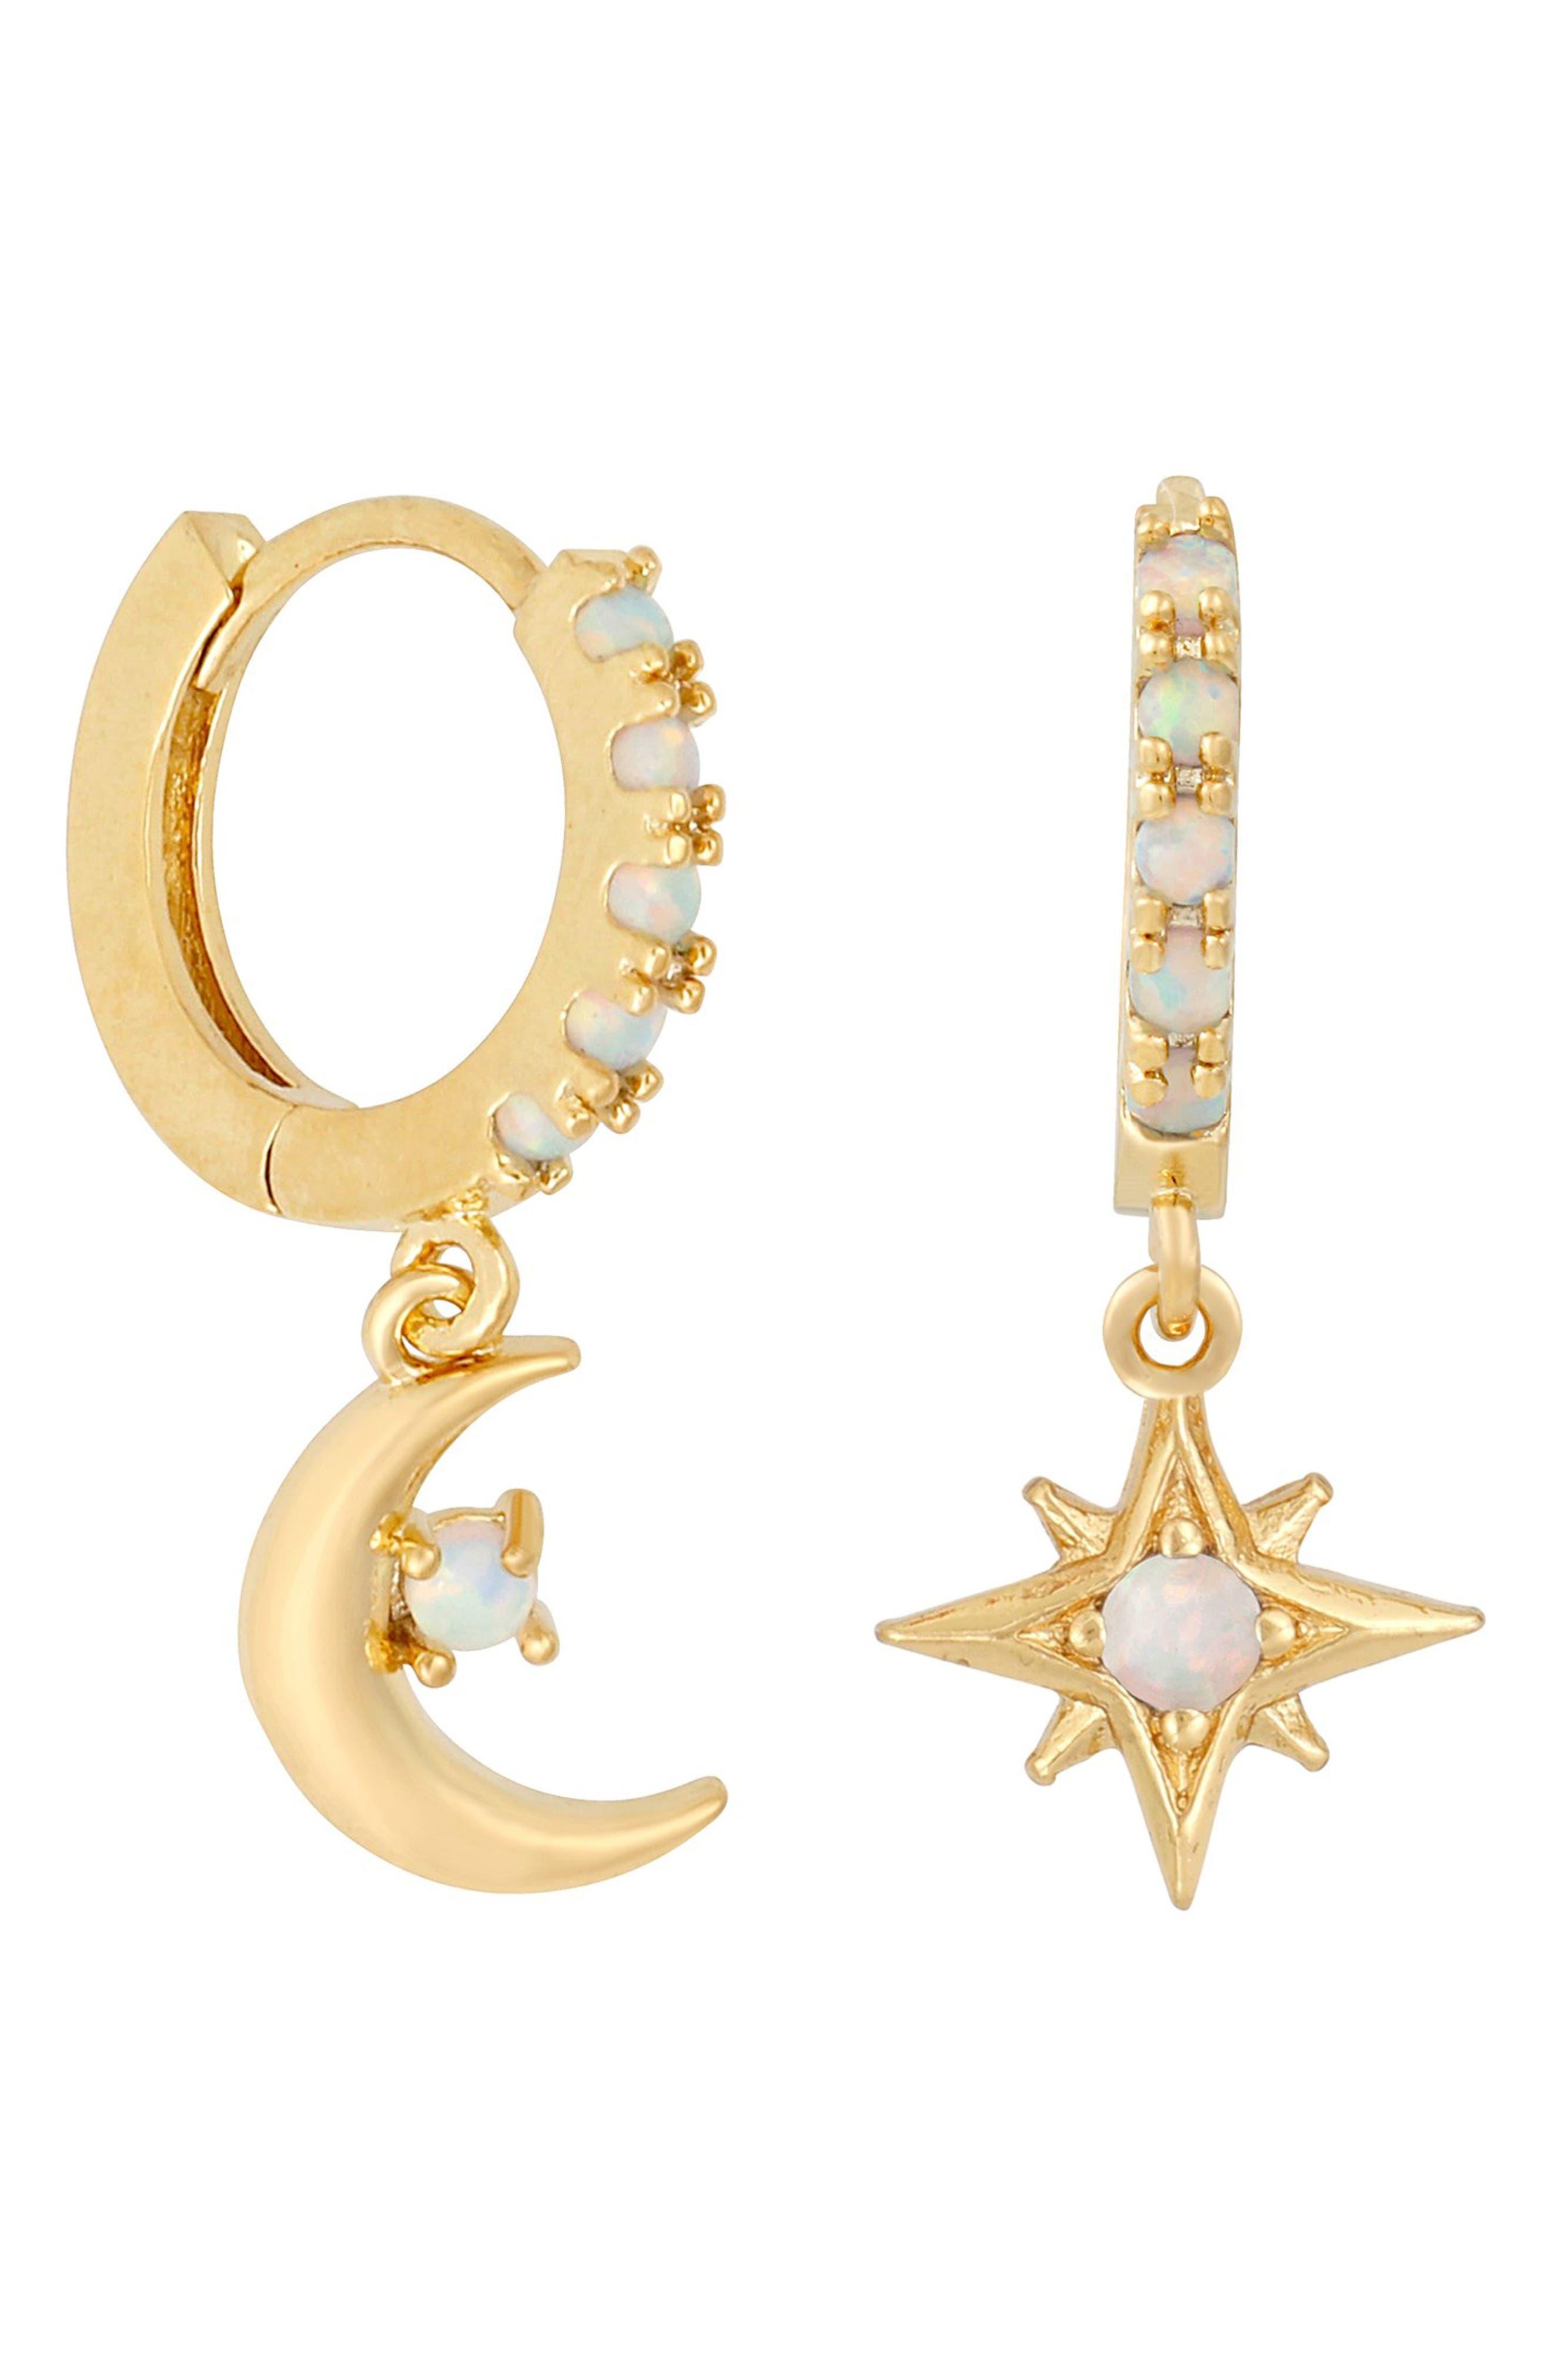 Starry Night Mismatched Hoop Earrings